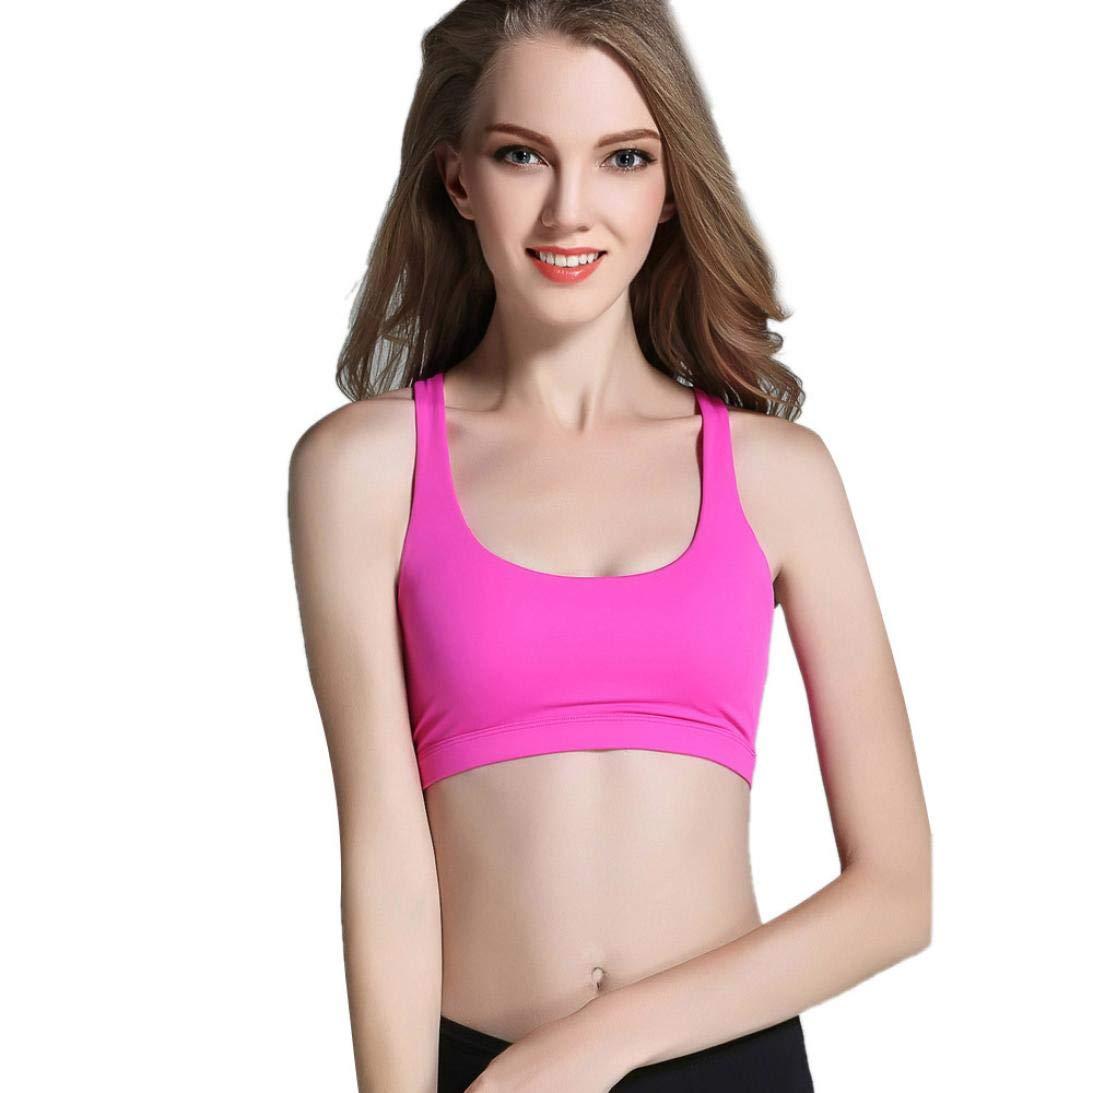 bc6c6a38d1 Amazon.com   Women Sports Bra Sexy Crop Bustier Strapless Comfortable  Nursing Tank Tops (L